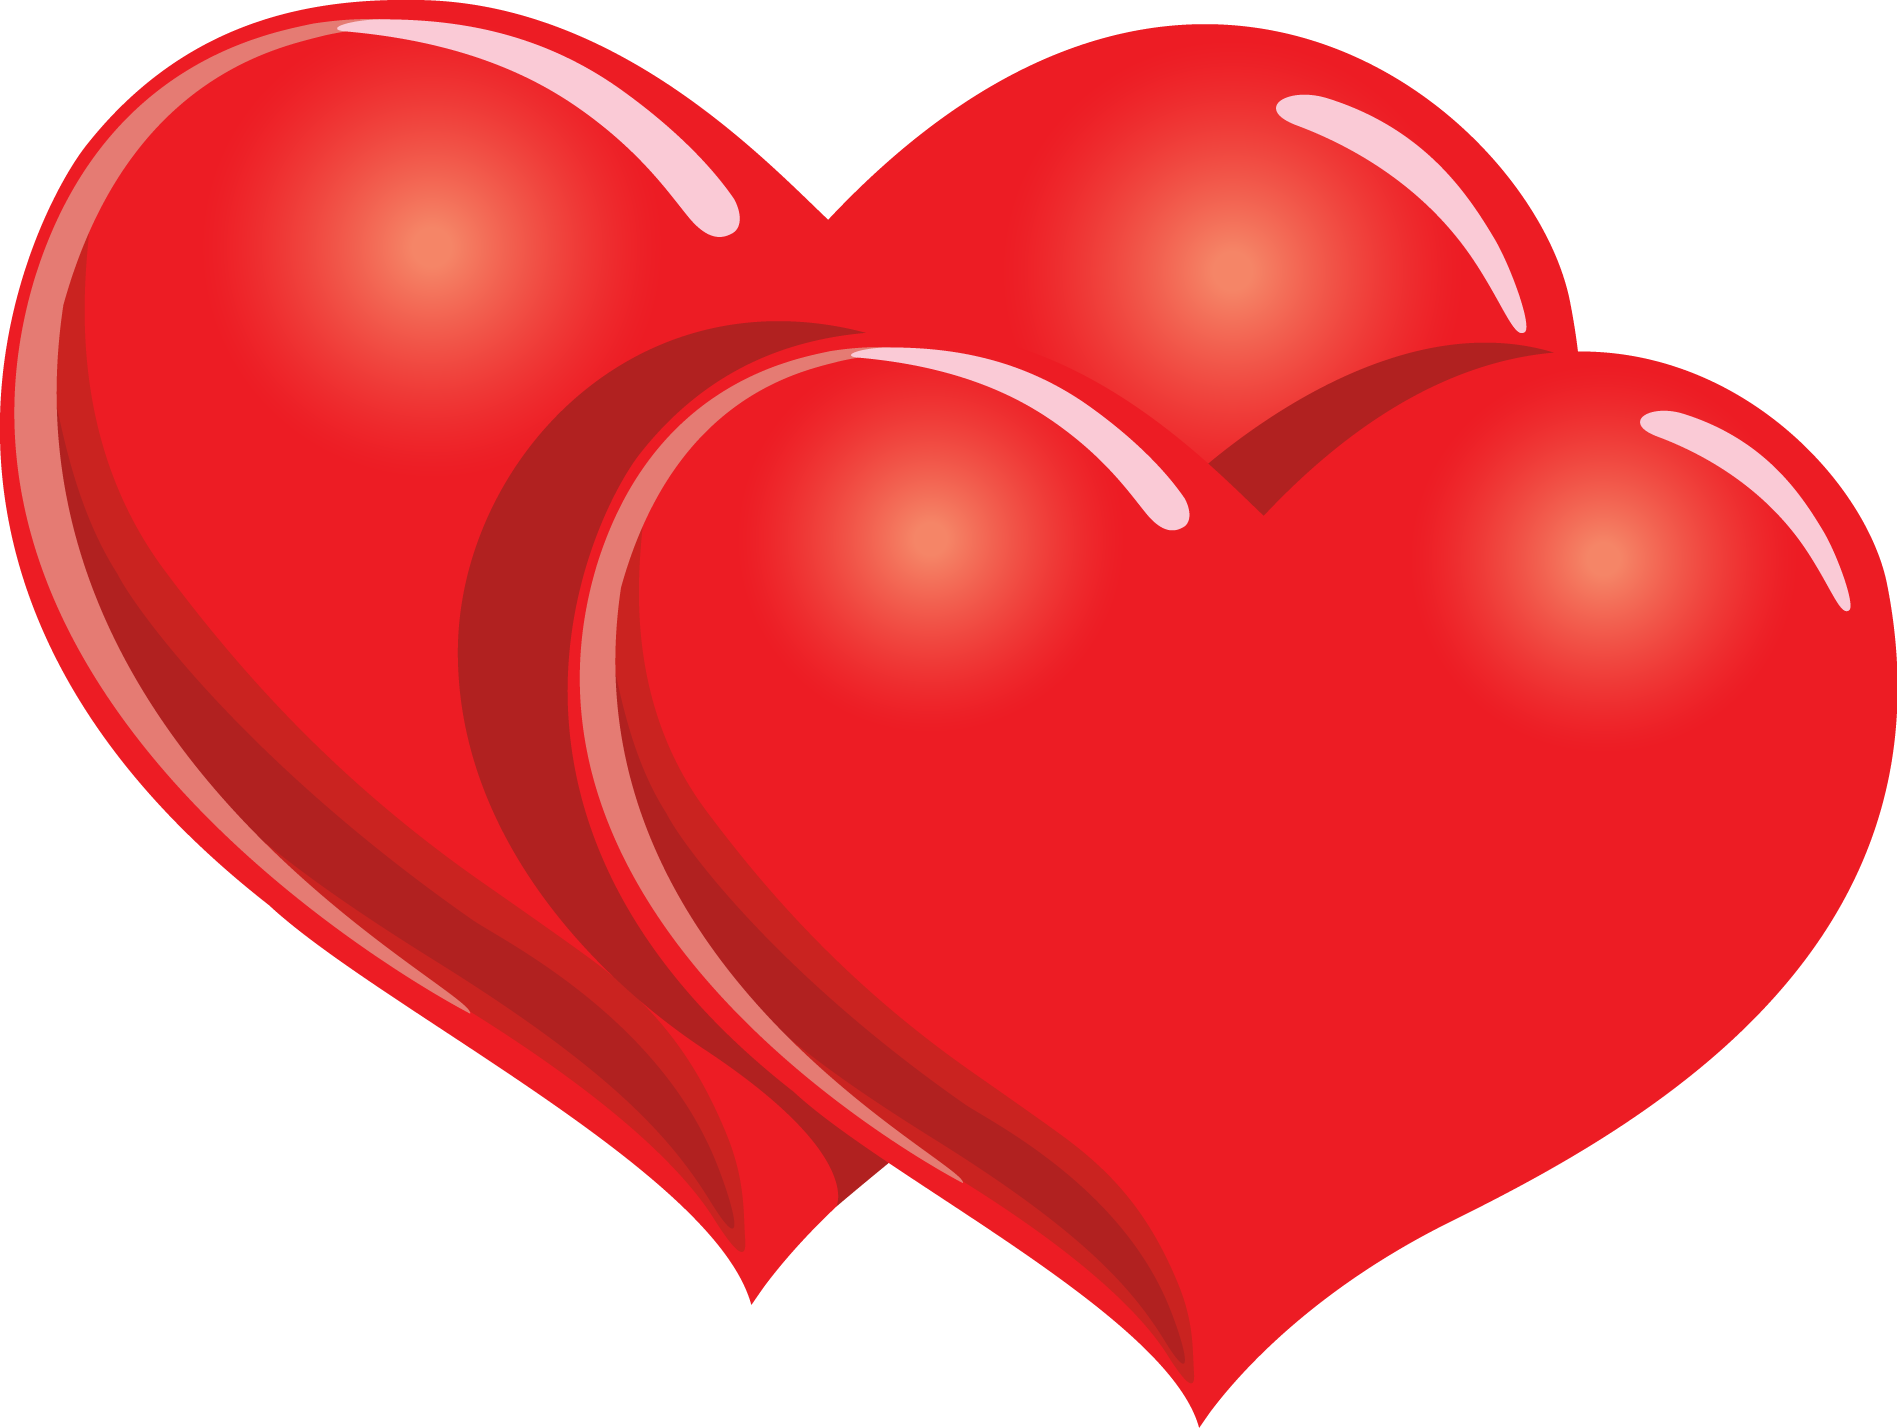 Hearts clipart pizza. Sweethearts dance rhtigertalk tworedhearts